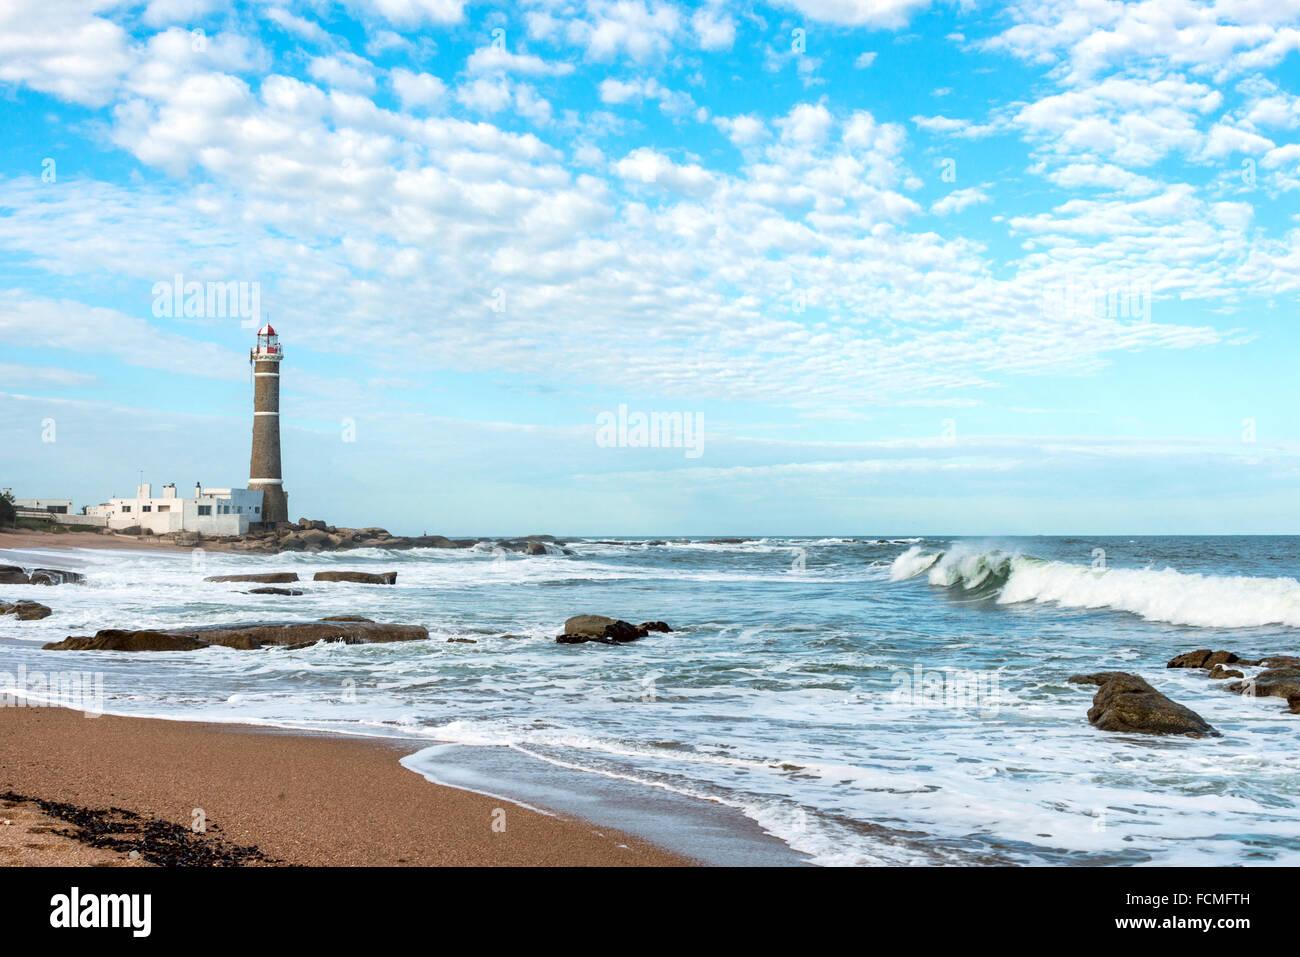 Lighthouse in Jose Ignacio near Punta del Este, Atlantic Coast, Uruguay - Stock Image